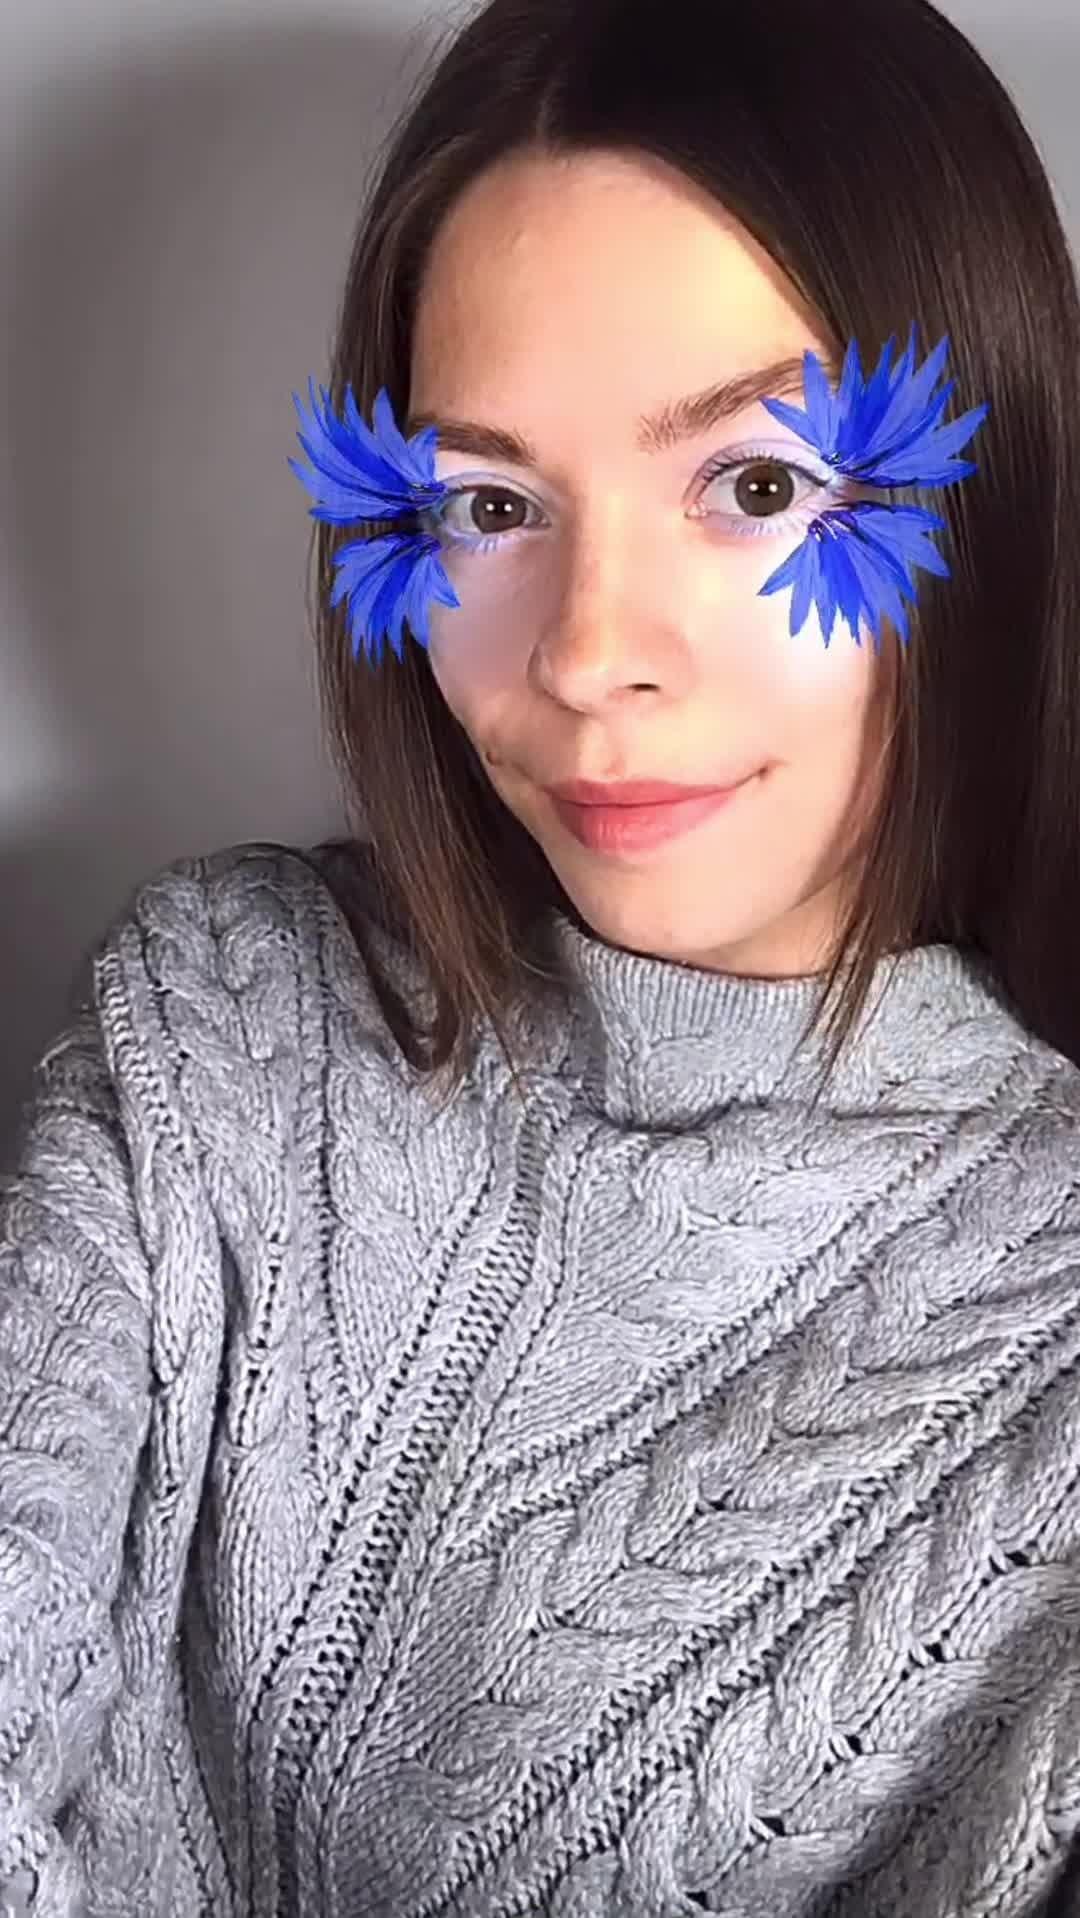 Instagram filter Л Е П Е С Т К И